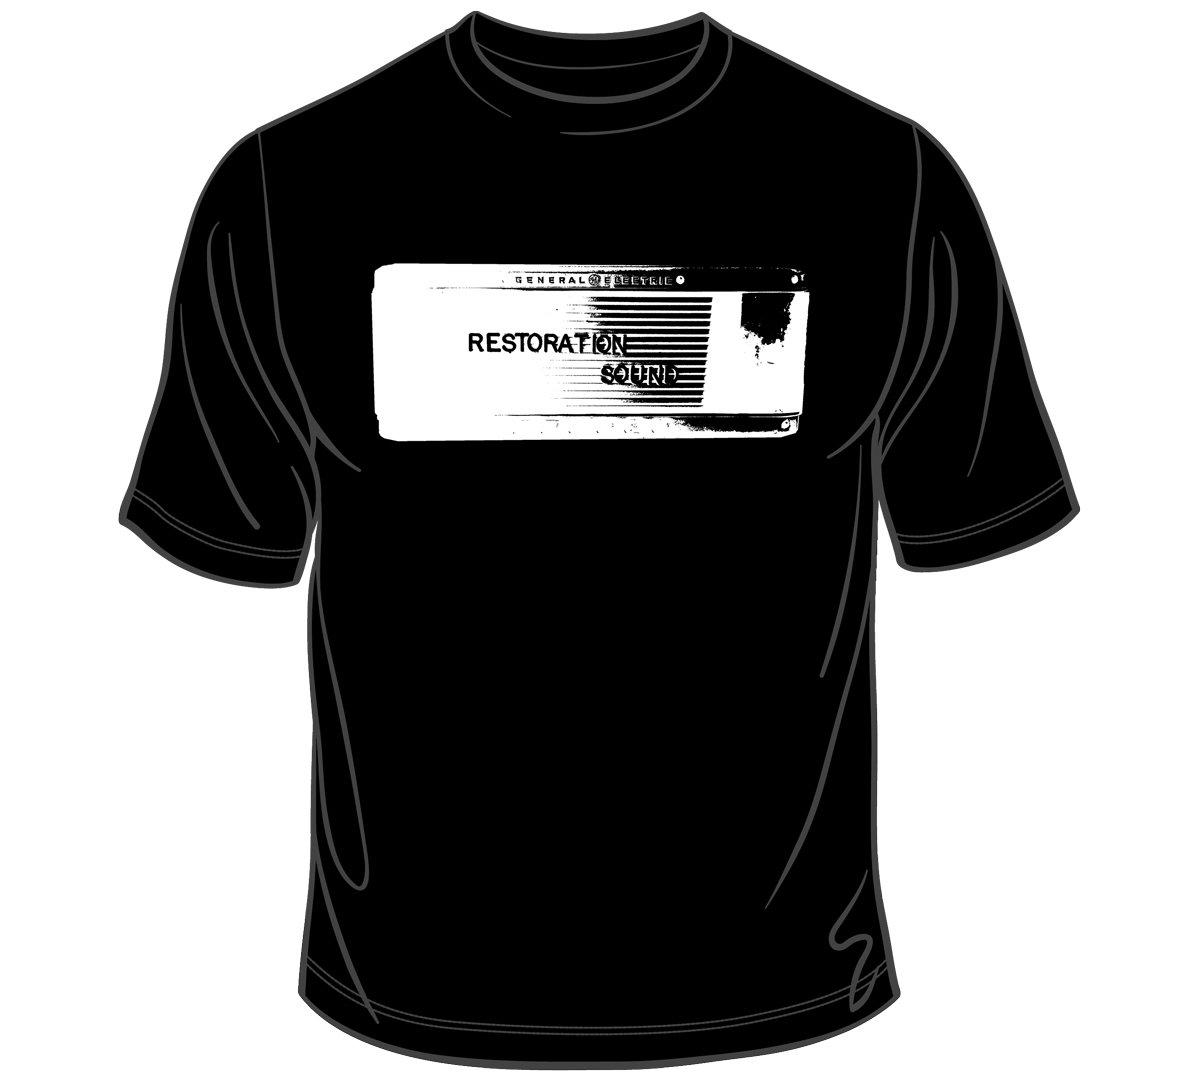 Restoration Sound T Shirt!